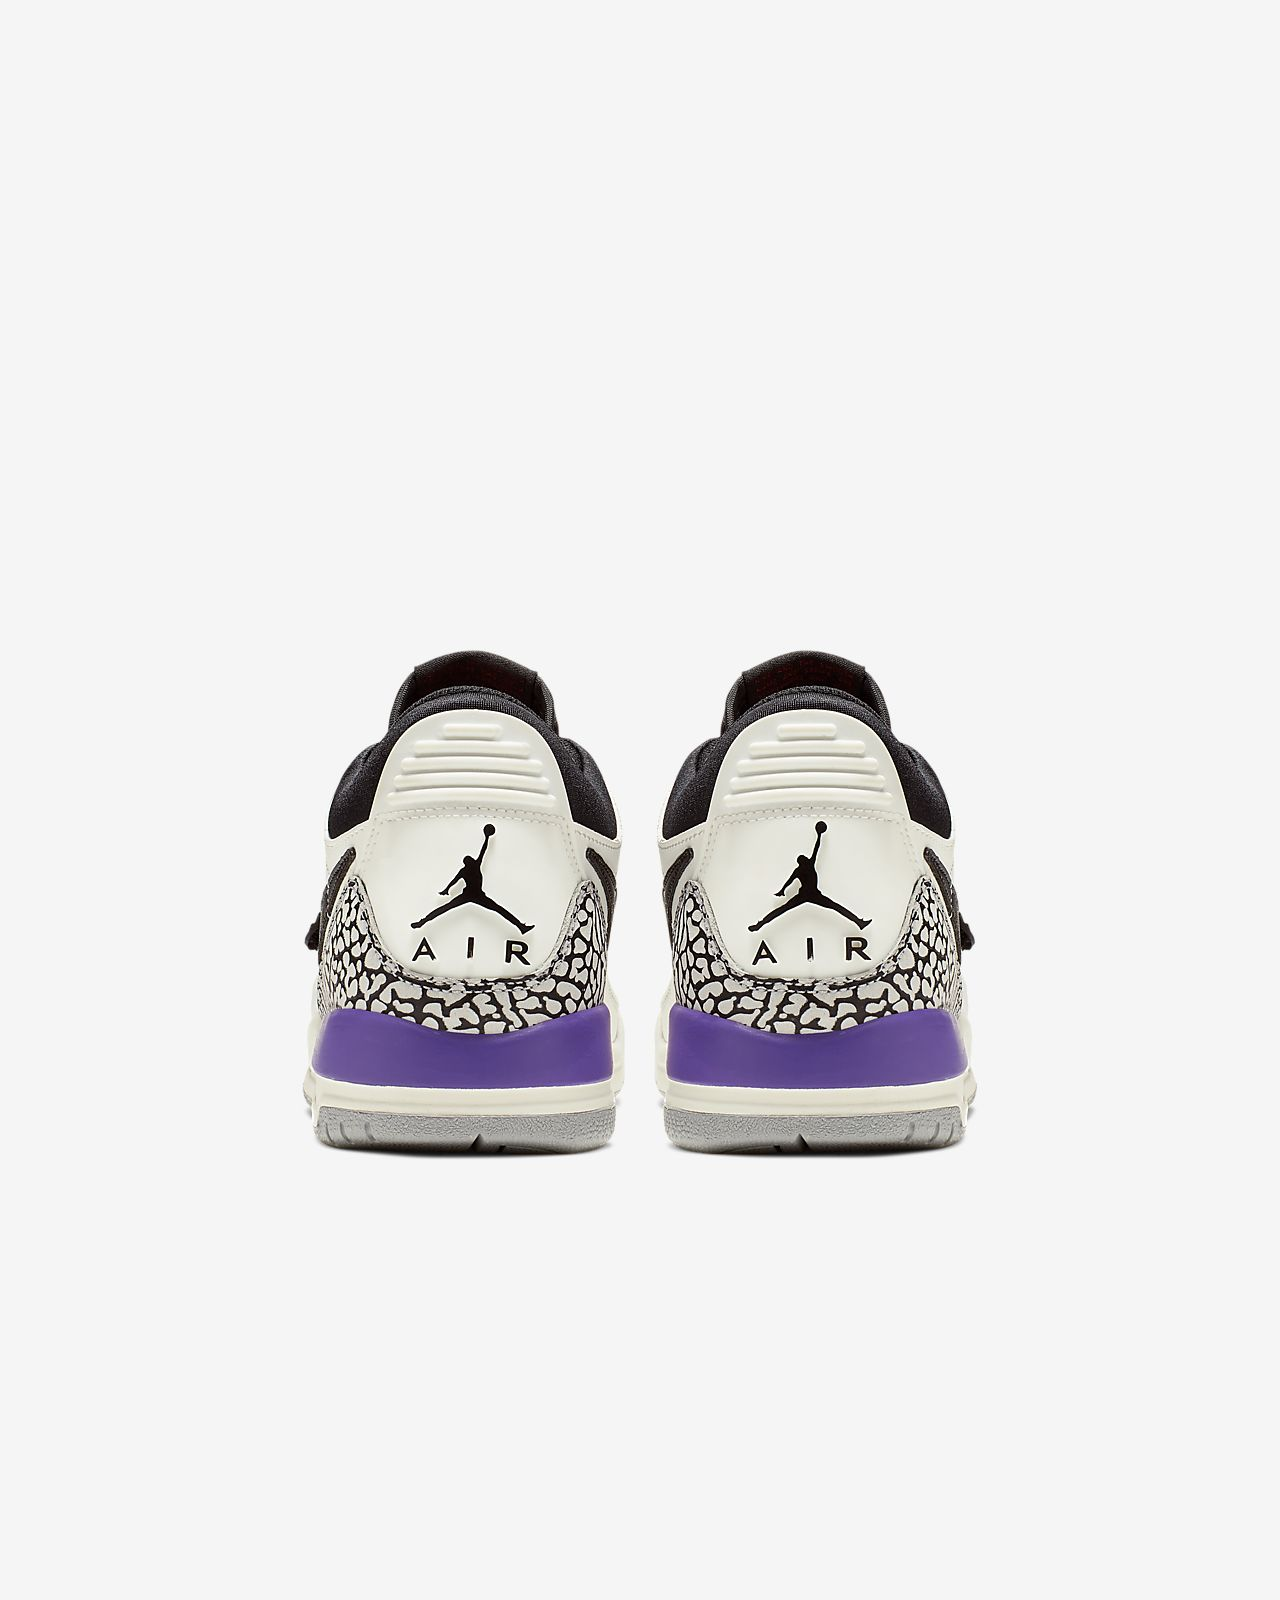 Calzado para niños talla grande Air Jordan Legacy 312 lOW